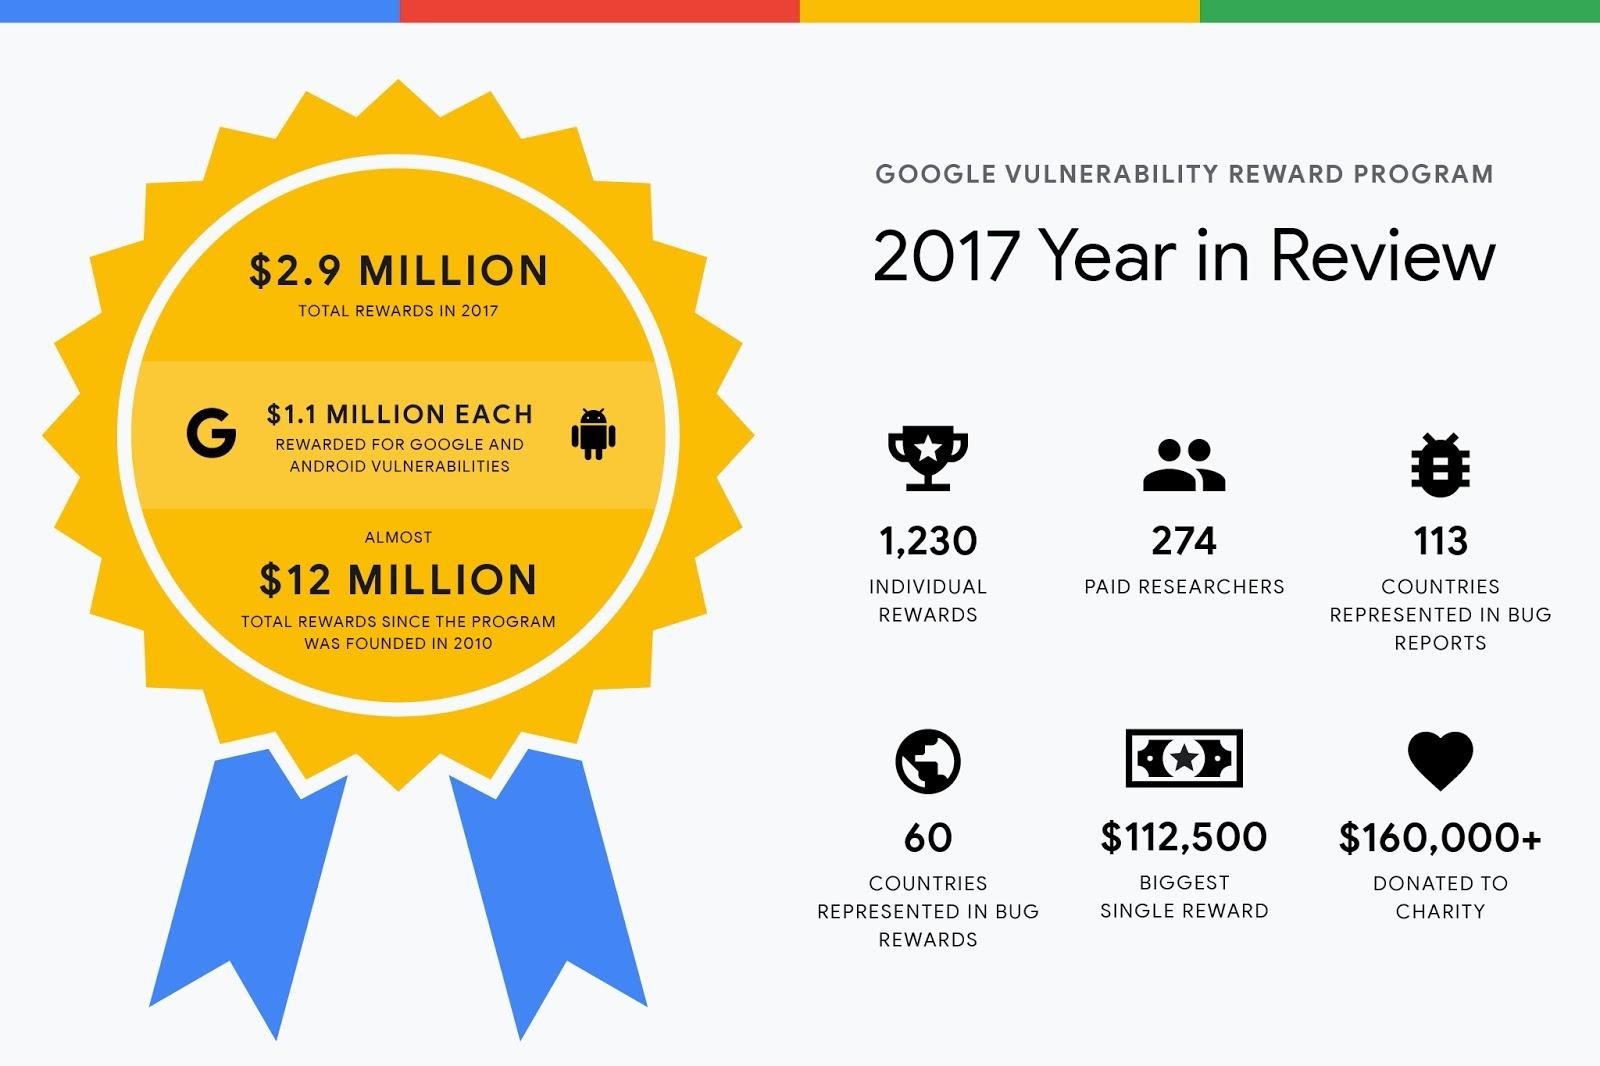 Google Vulnerability Reward Program 2016